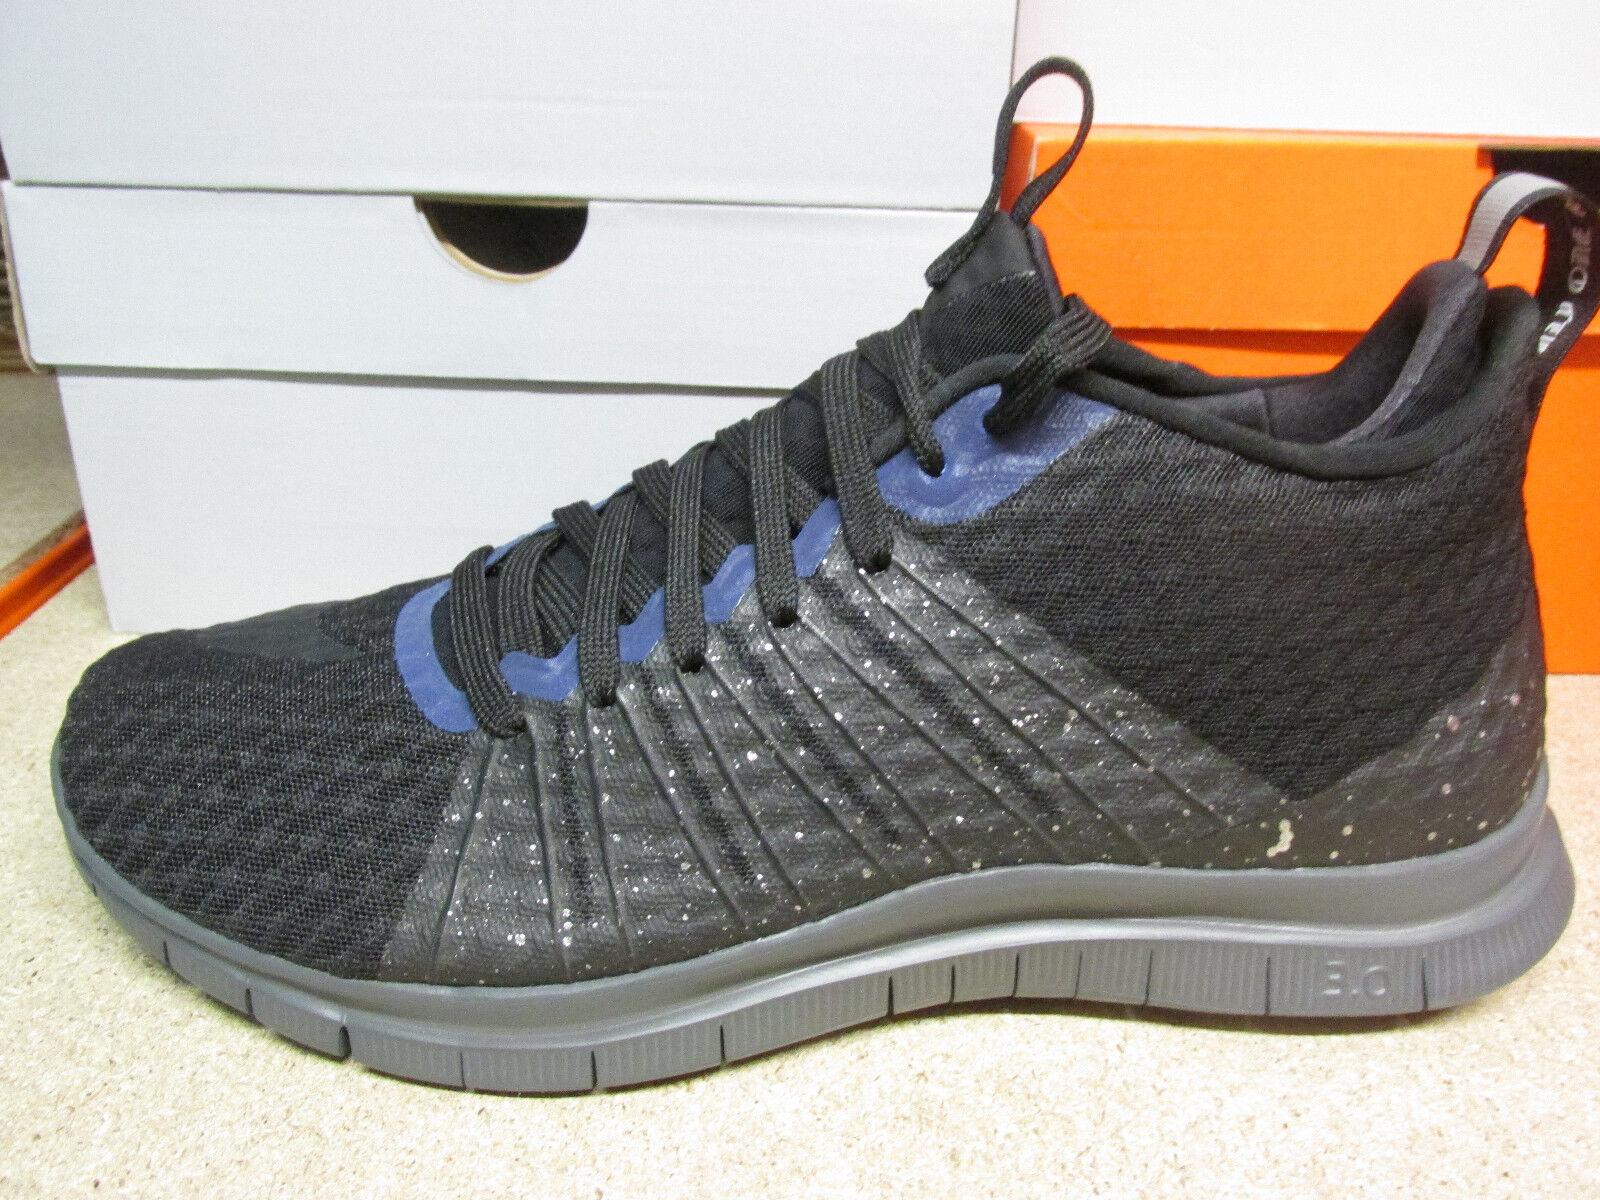 478612fca68 ... nike FC hypervenom 2 mid mens trainers 747140 005 sneakers sneakers  sneakers shoes f051c6 ...